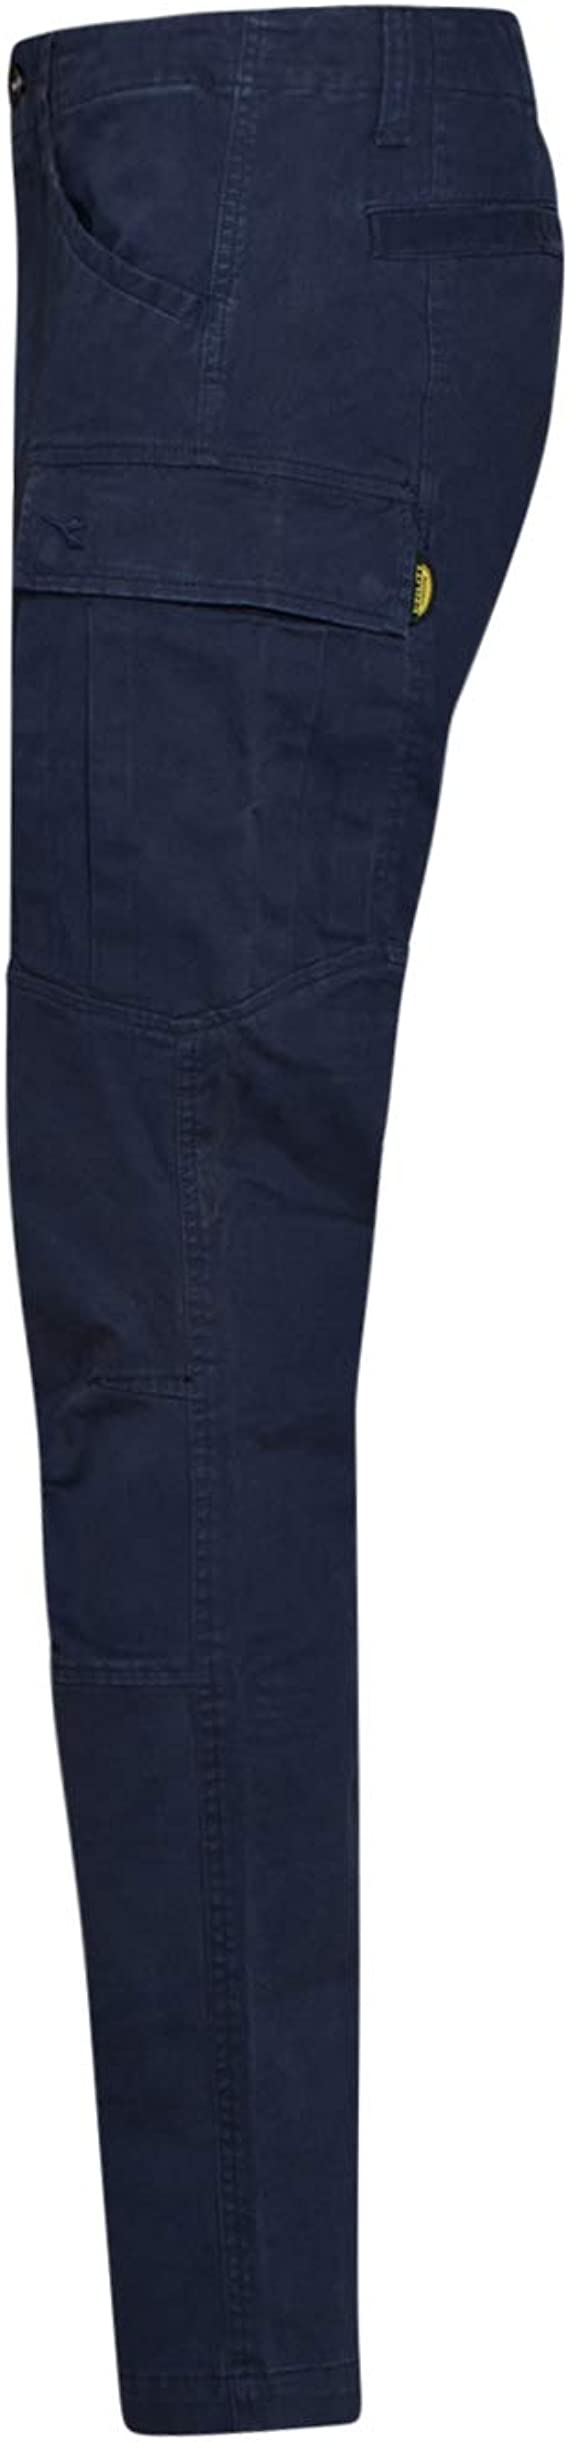 Utility Diadora Pantalon de Travail Cargo Pant New York pour Homme